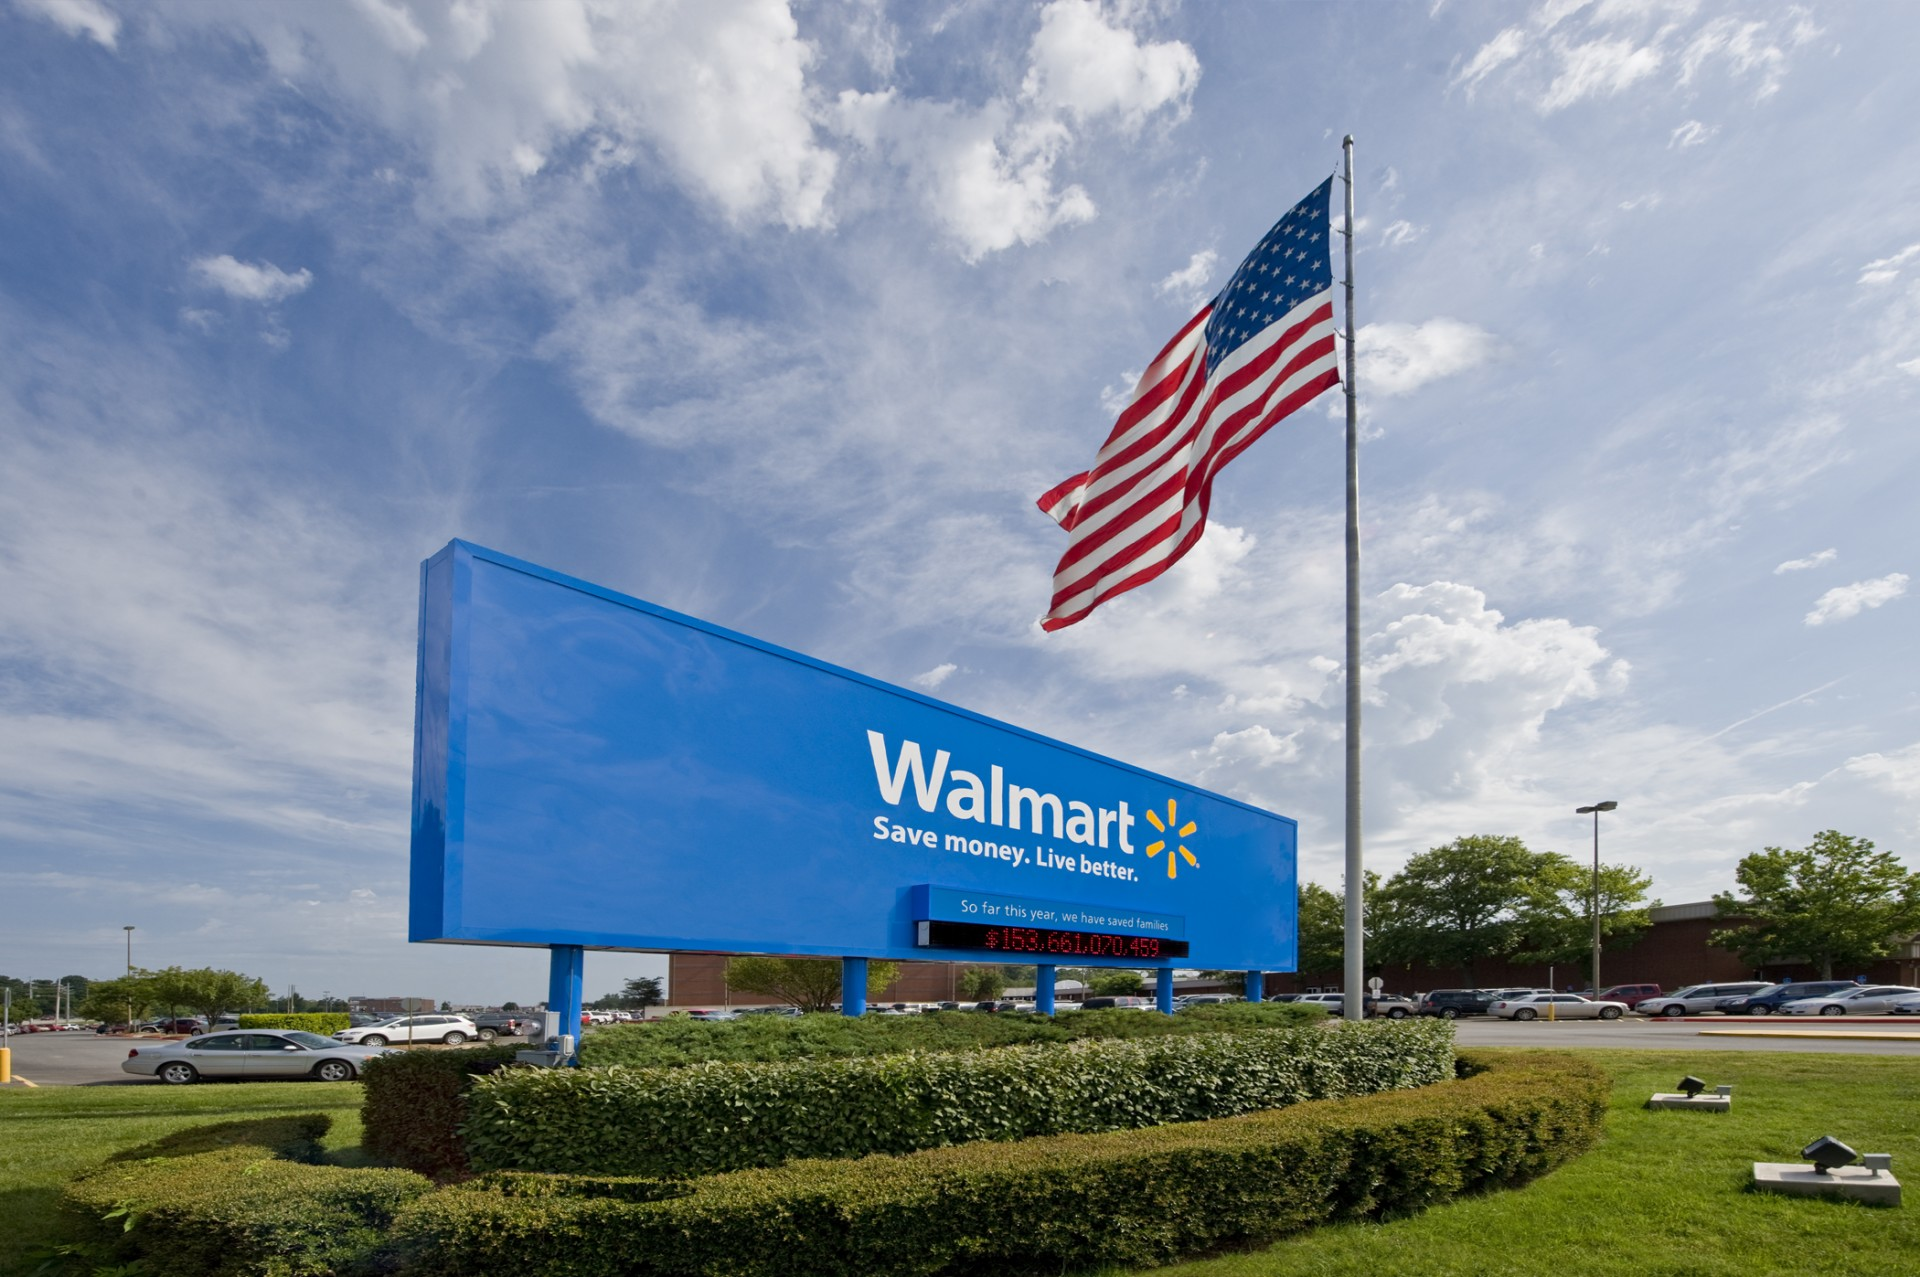 Walmart Corporate Contact >> Walmart S New Home Office